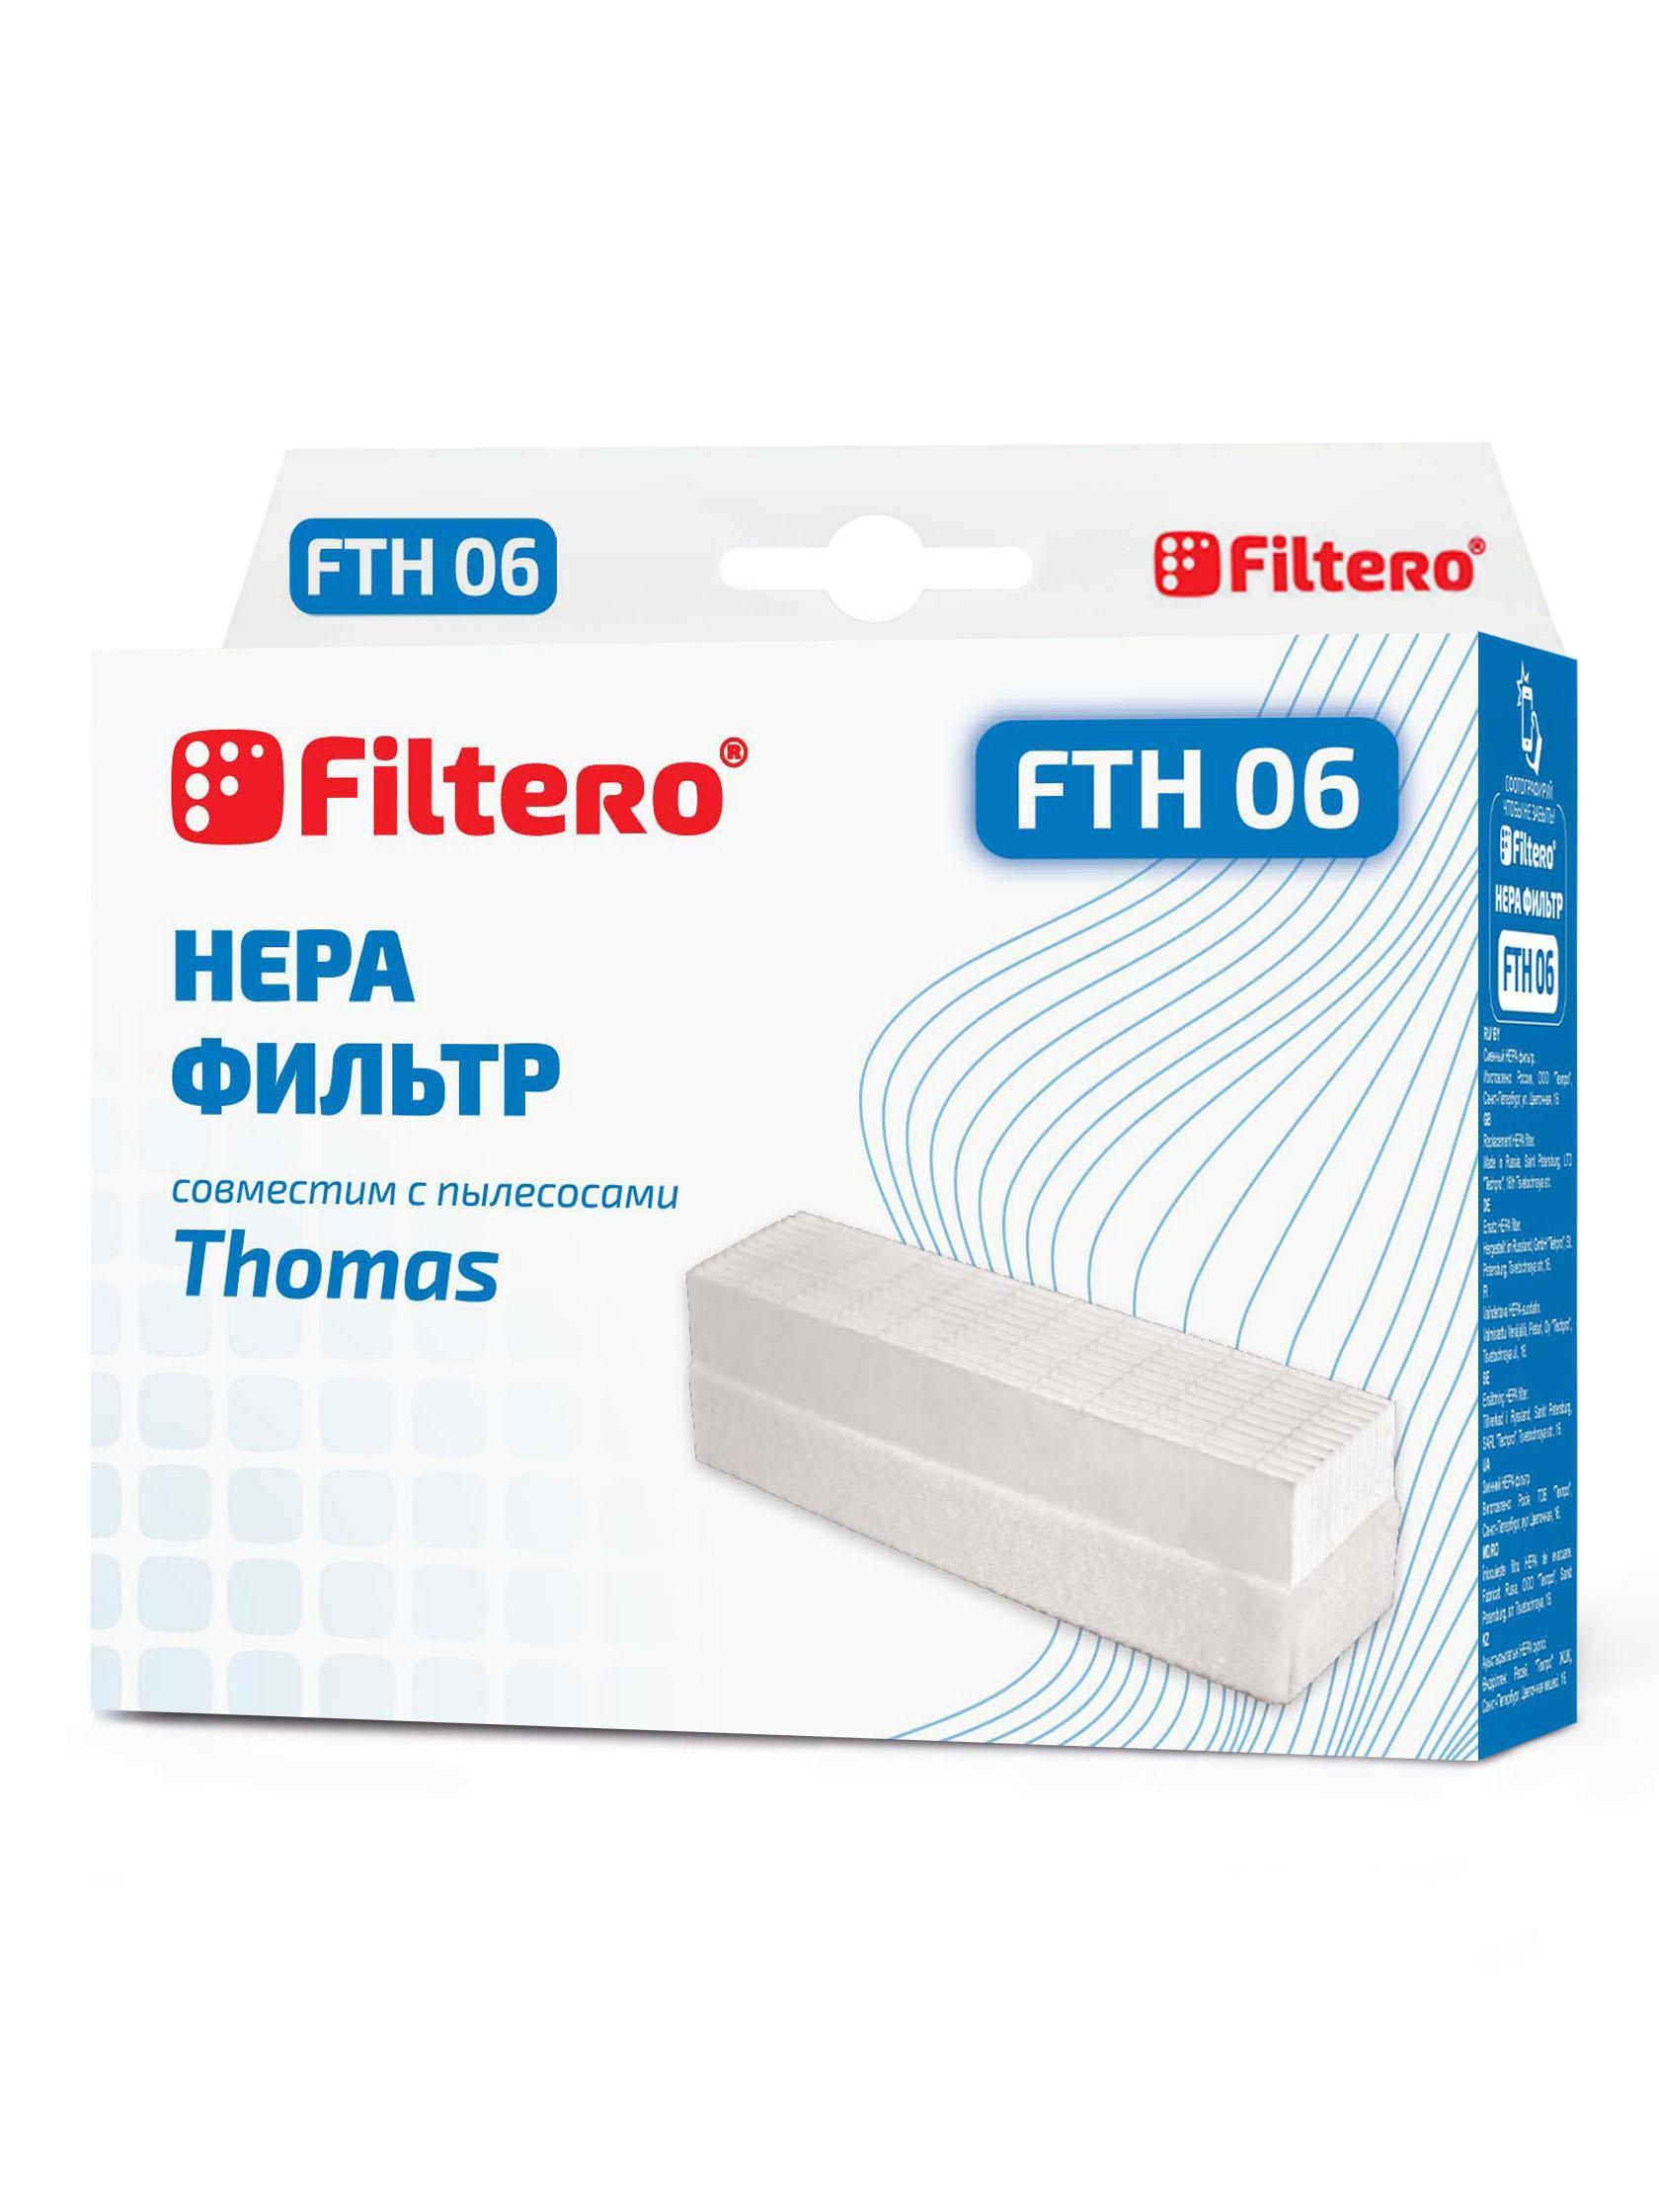 Фильтр Filtero Fth 06 tms